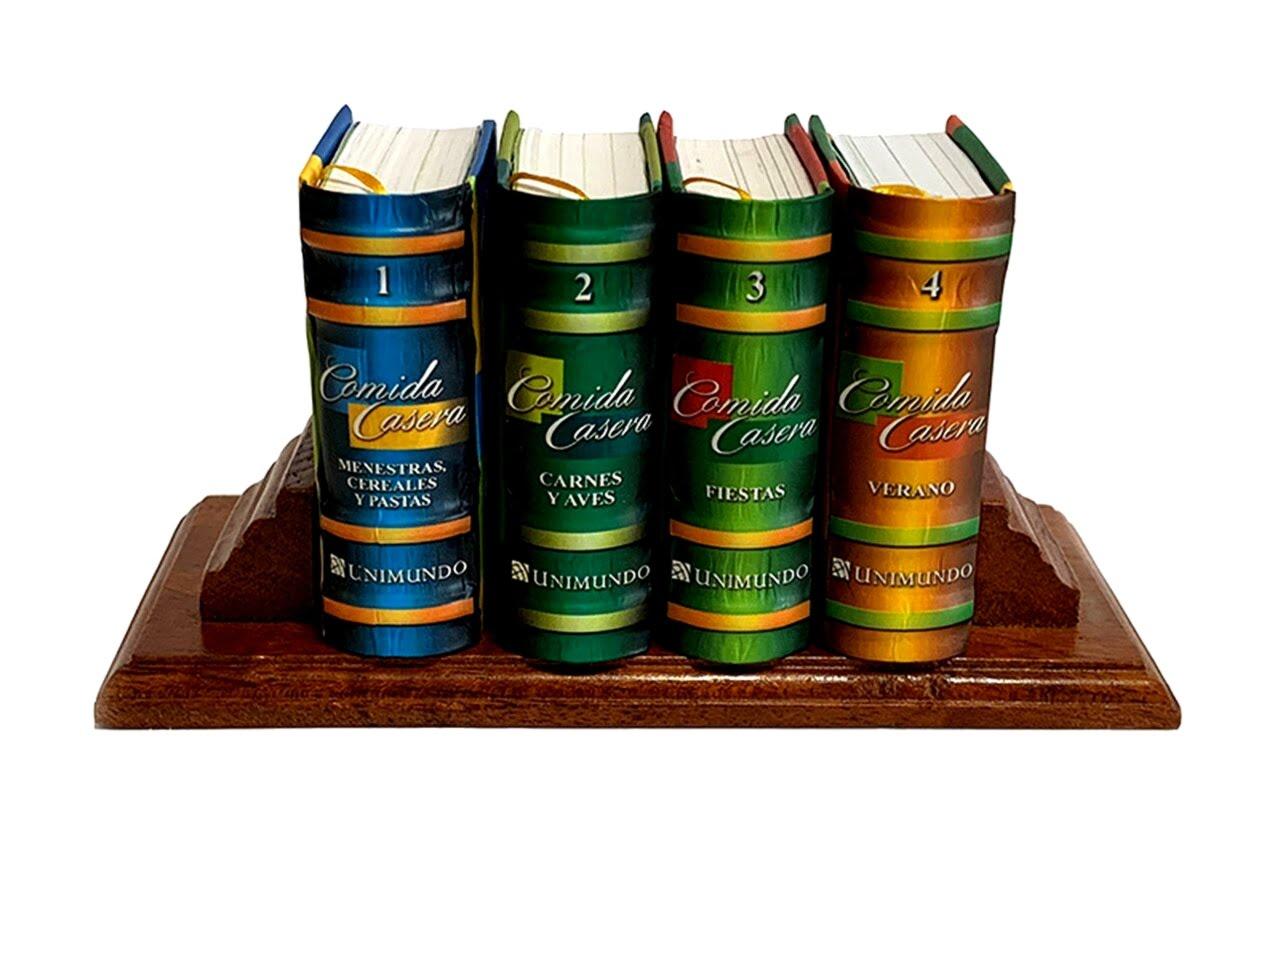 comida-casera-coleccion-miniature-book-libro